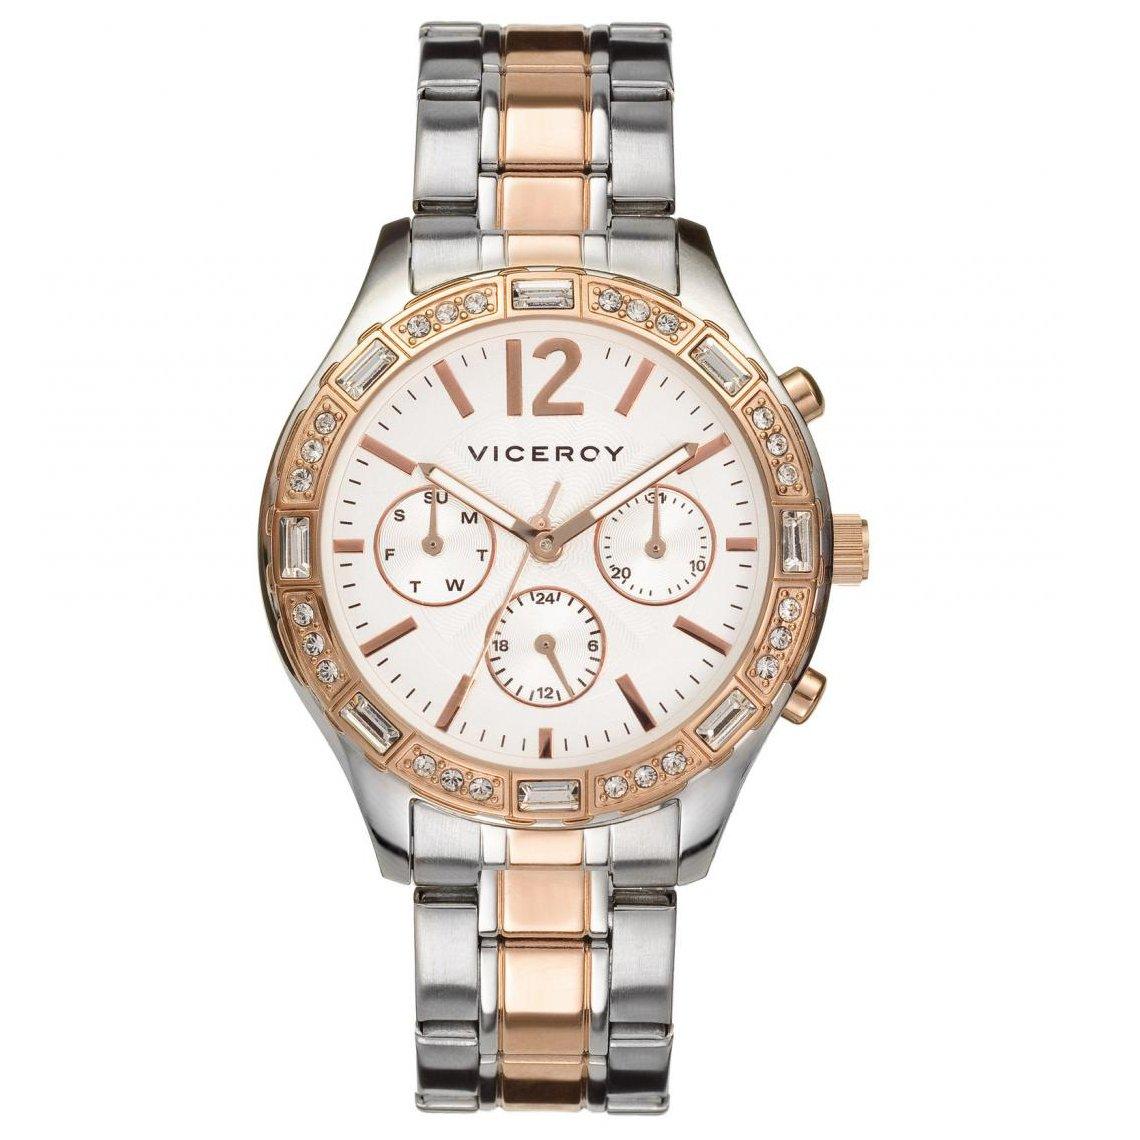 Amazon.com: RELOJ VICEROY 40748-05 MUJER: Watches